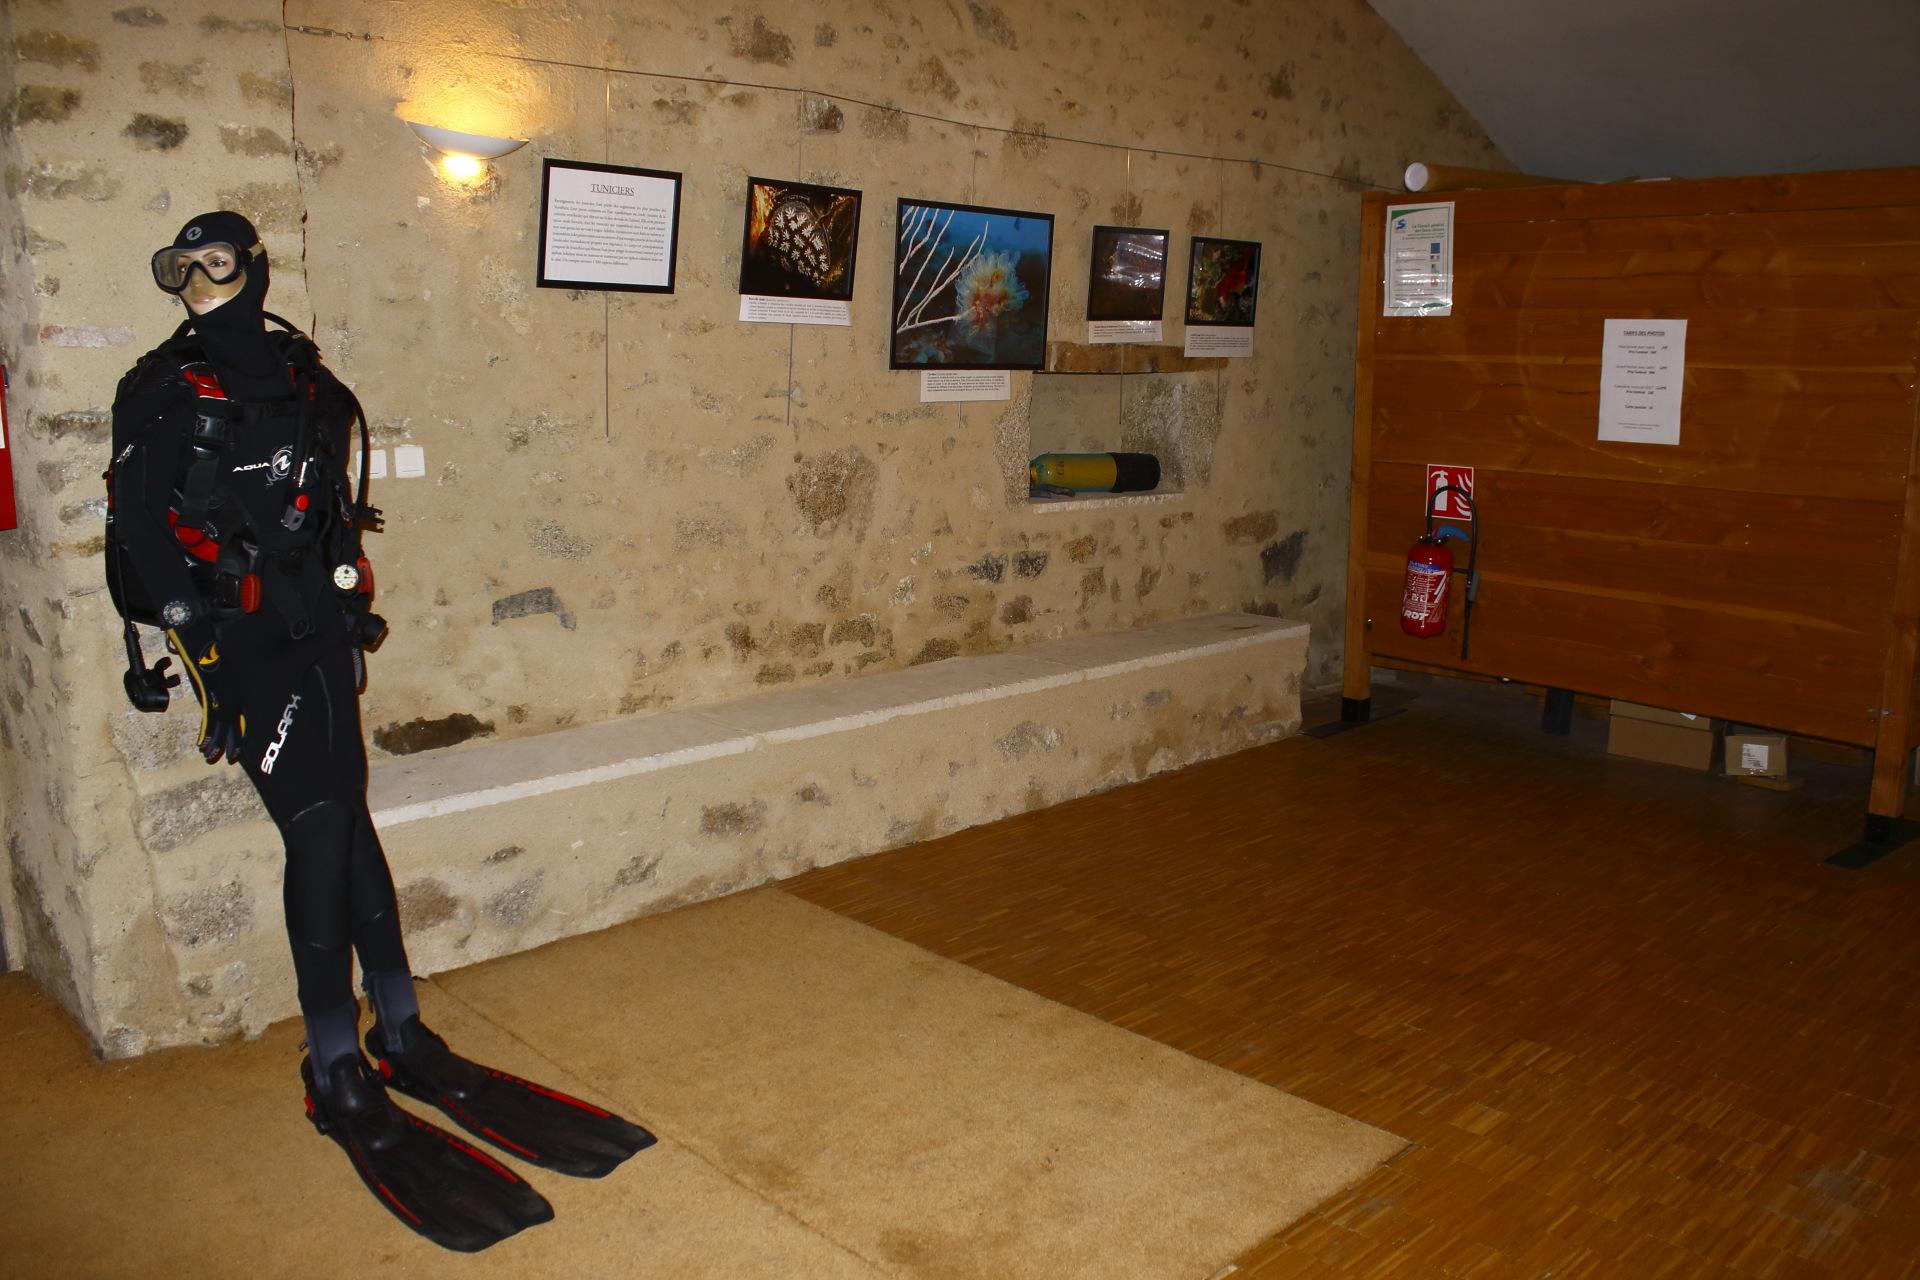 Mur des Tuniciers © Oct16 - Florian Bernier